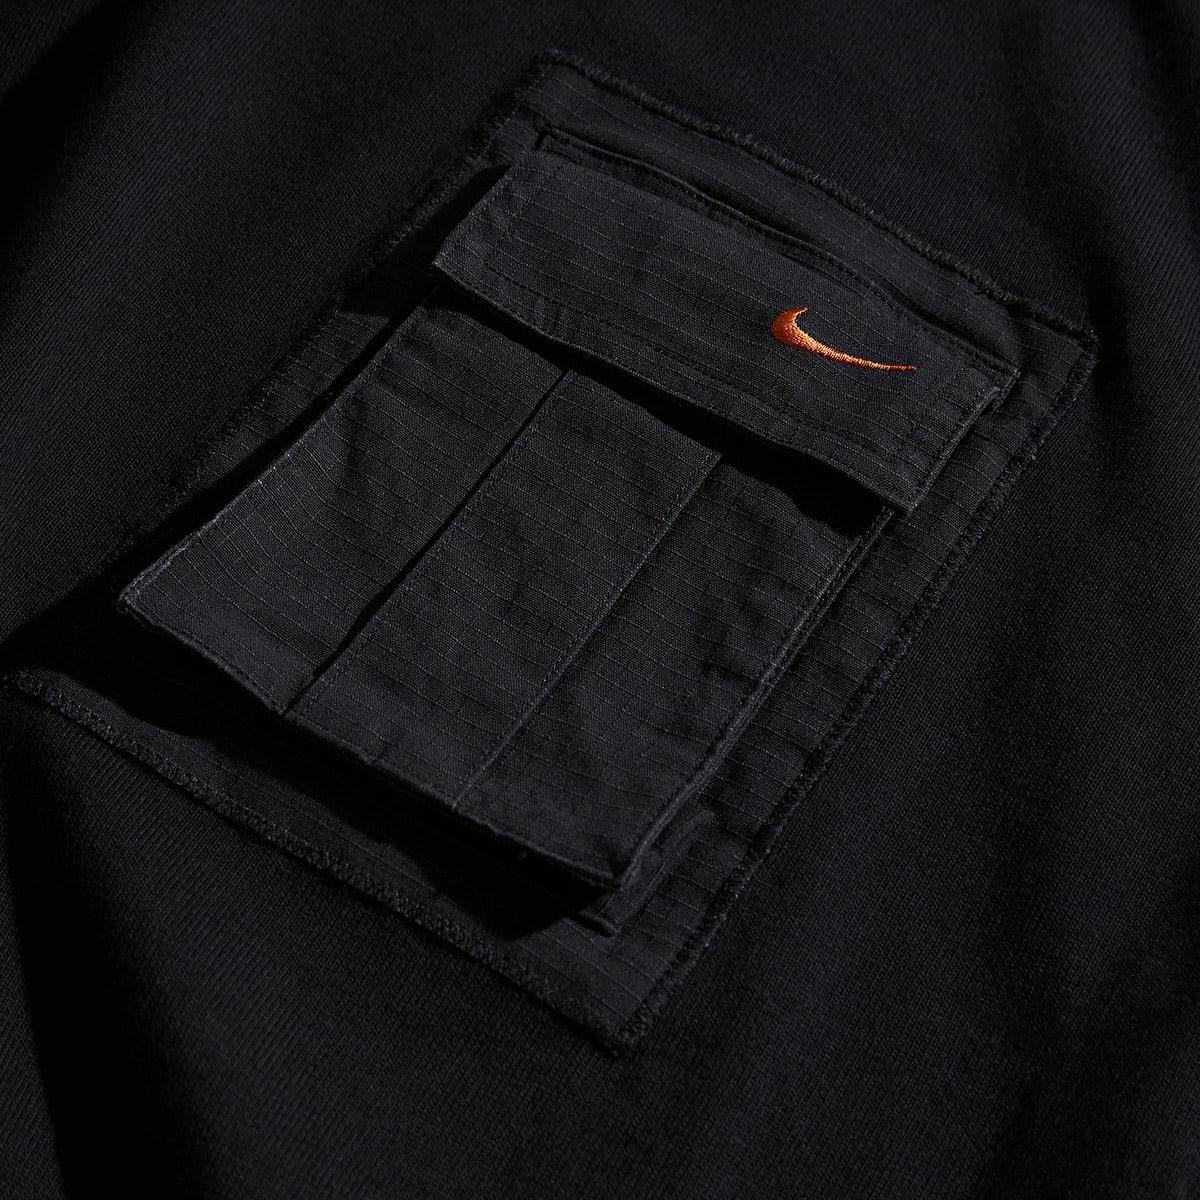 Nike x Cactus Jack Tee - CU0460-010